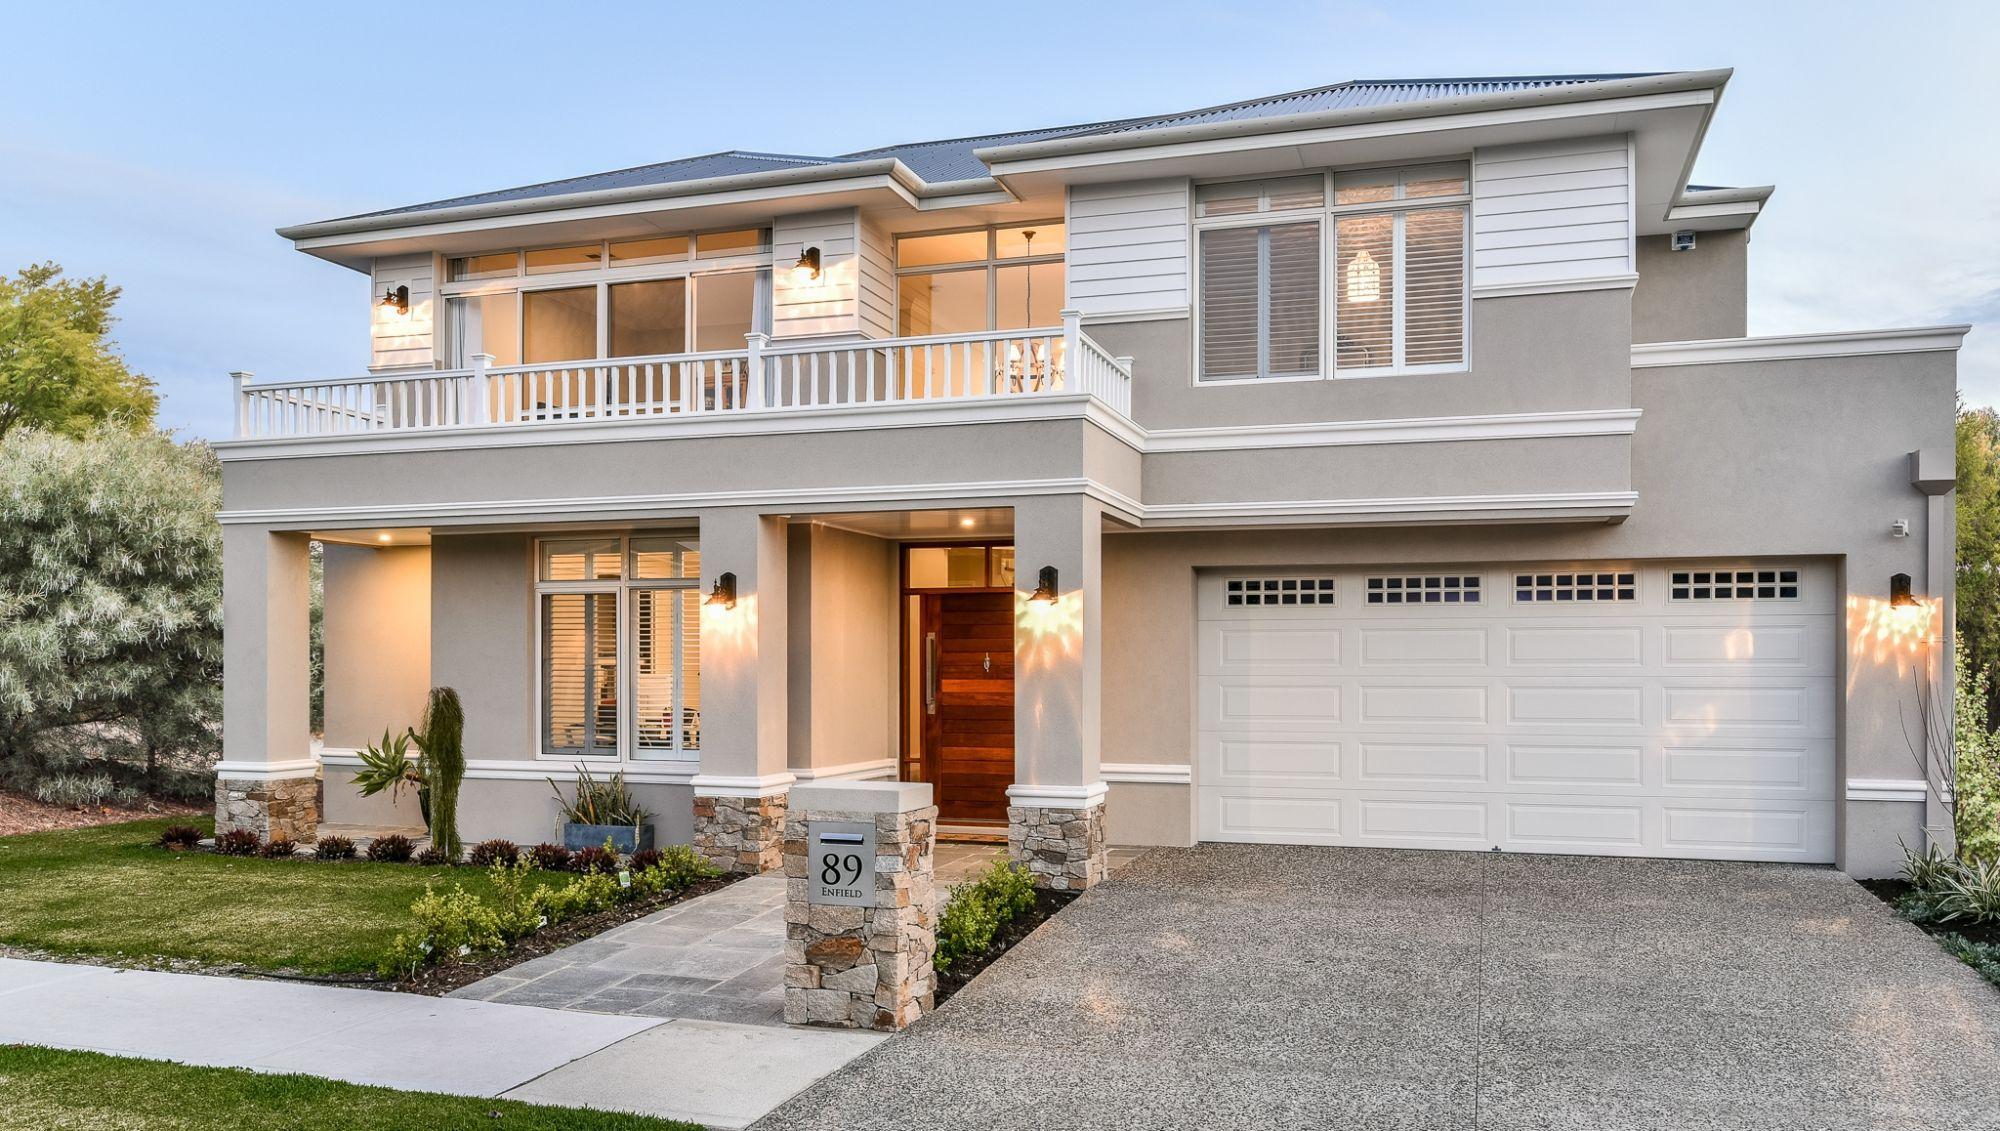 Split Roof Design: Split Level Homes Plans Wish Thought That Design Ideas For